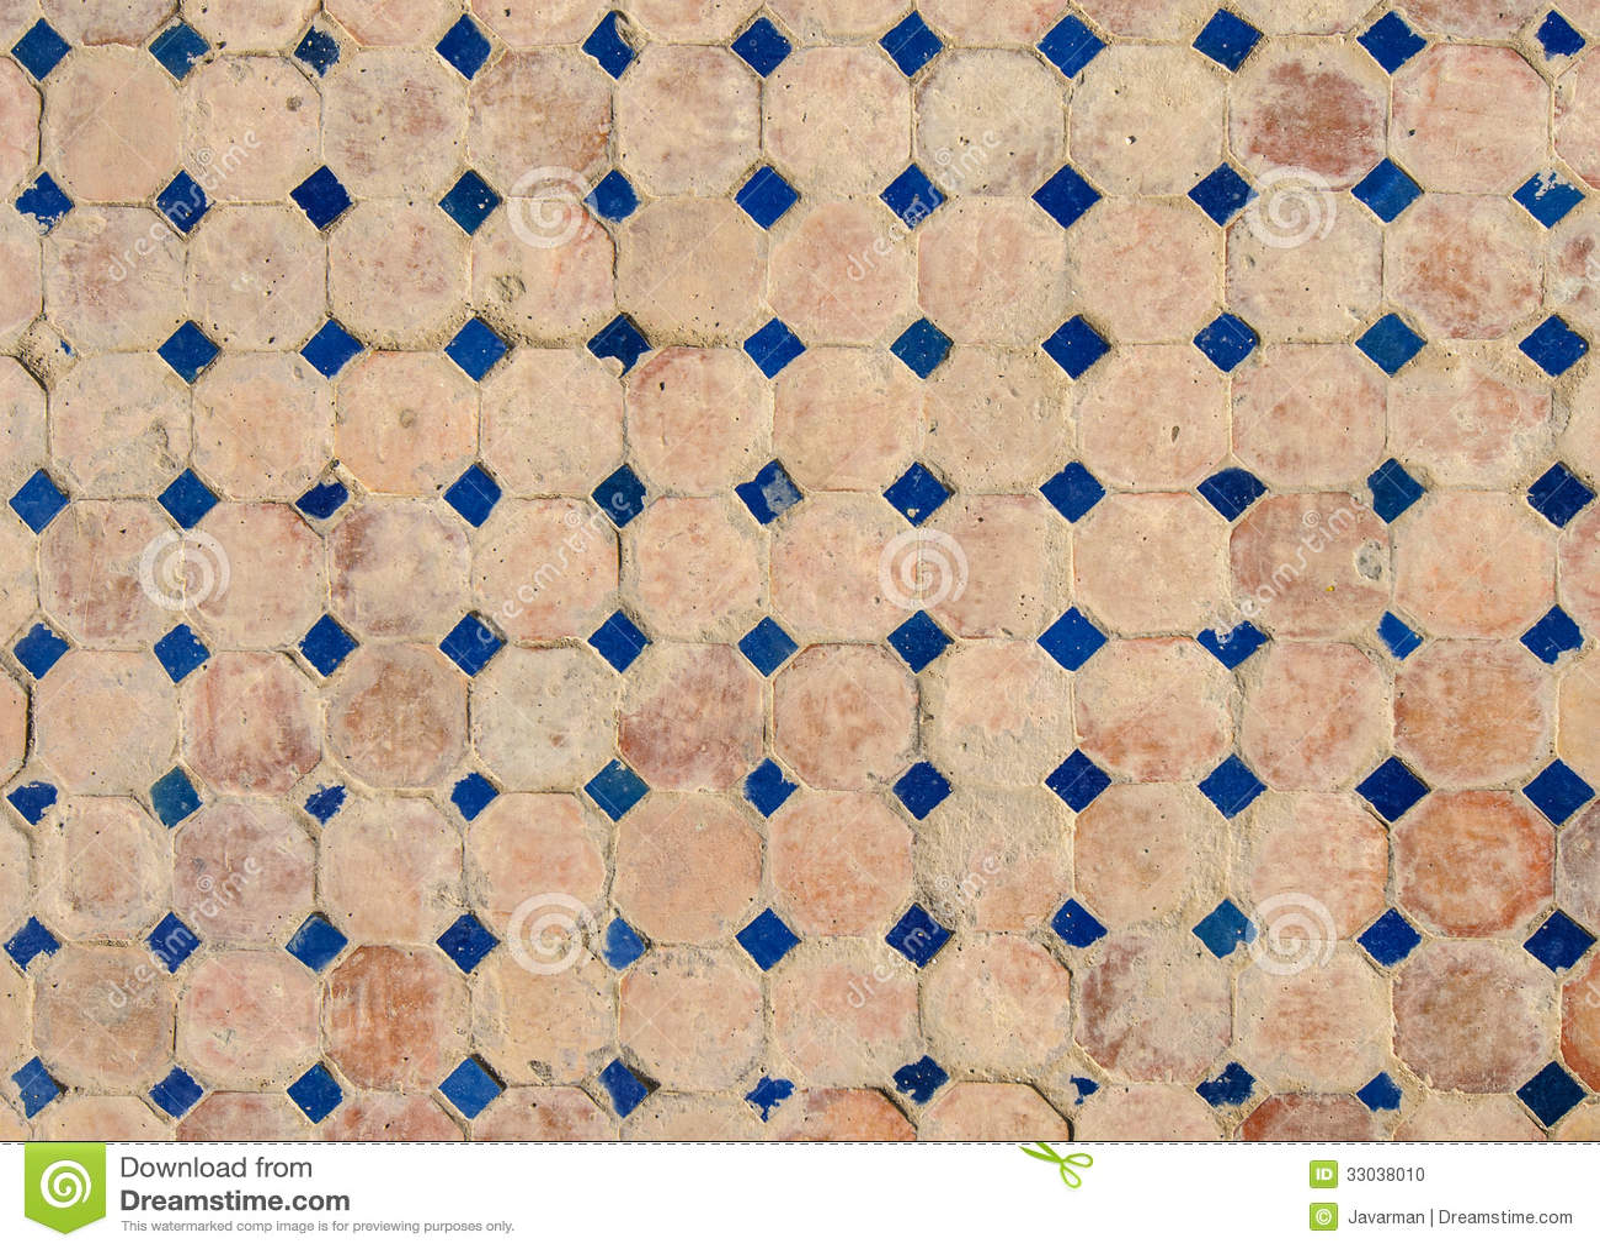 Moroccan vintage tile background stock photo image 33038010